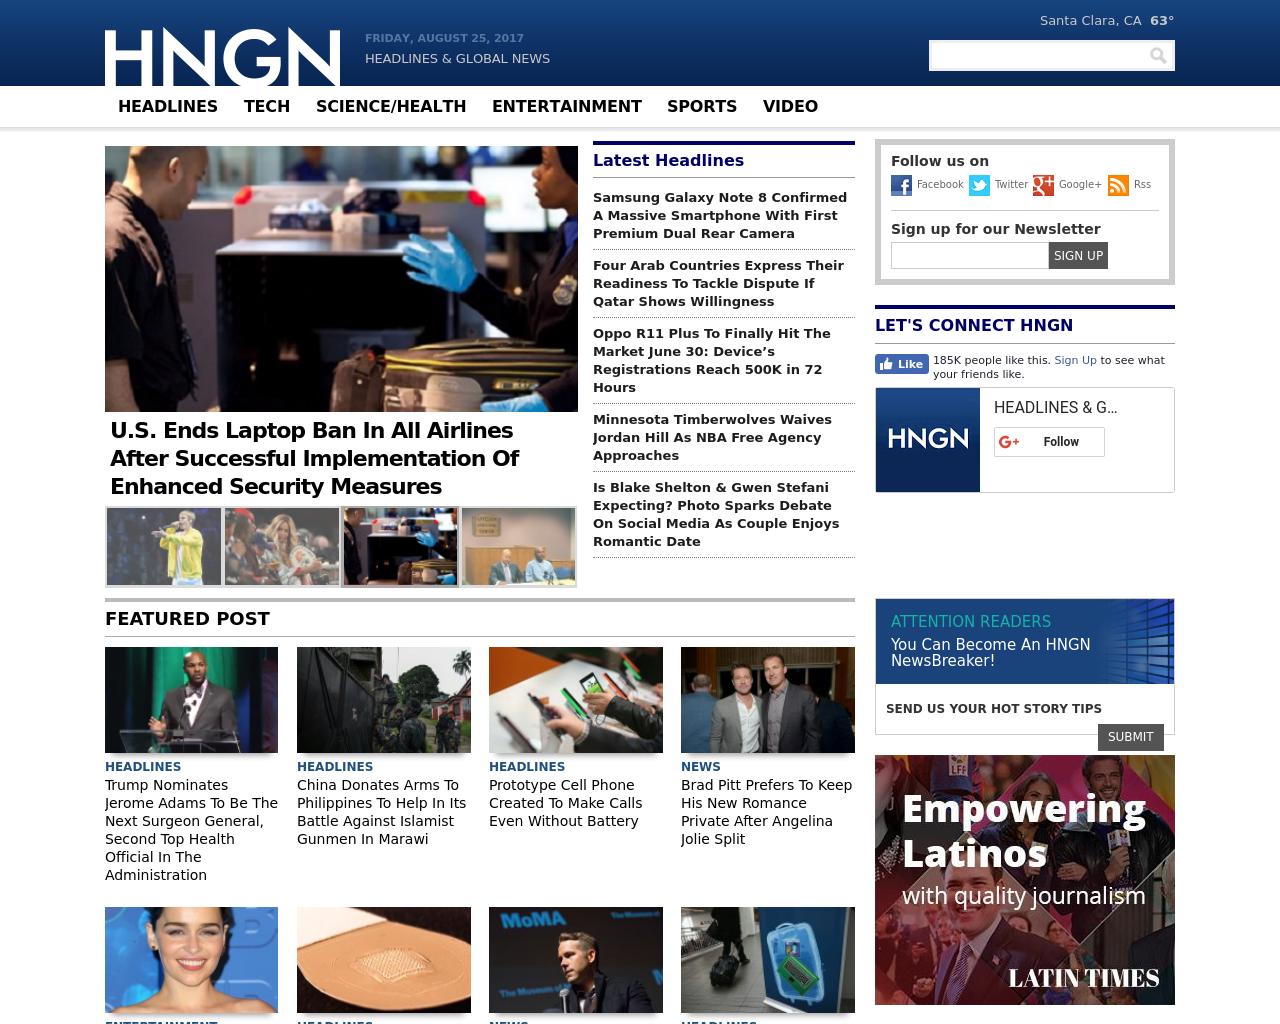 Headlines-&-Global-News-Advertising-Reviews-Pricing